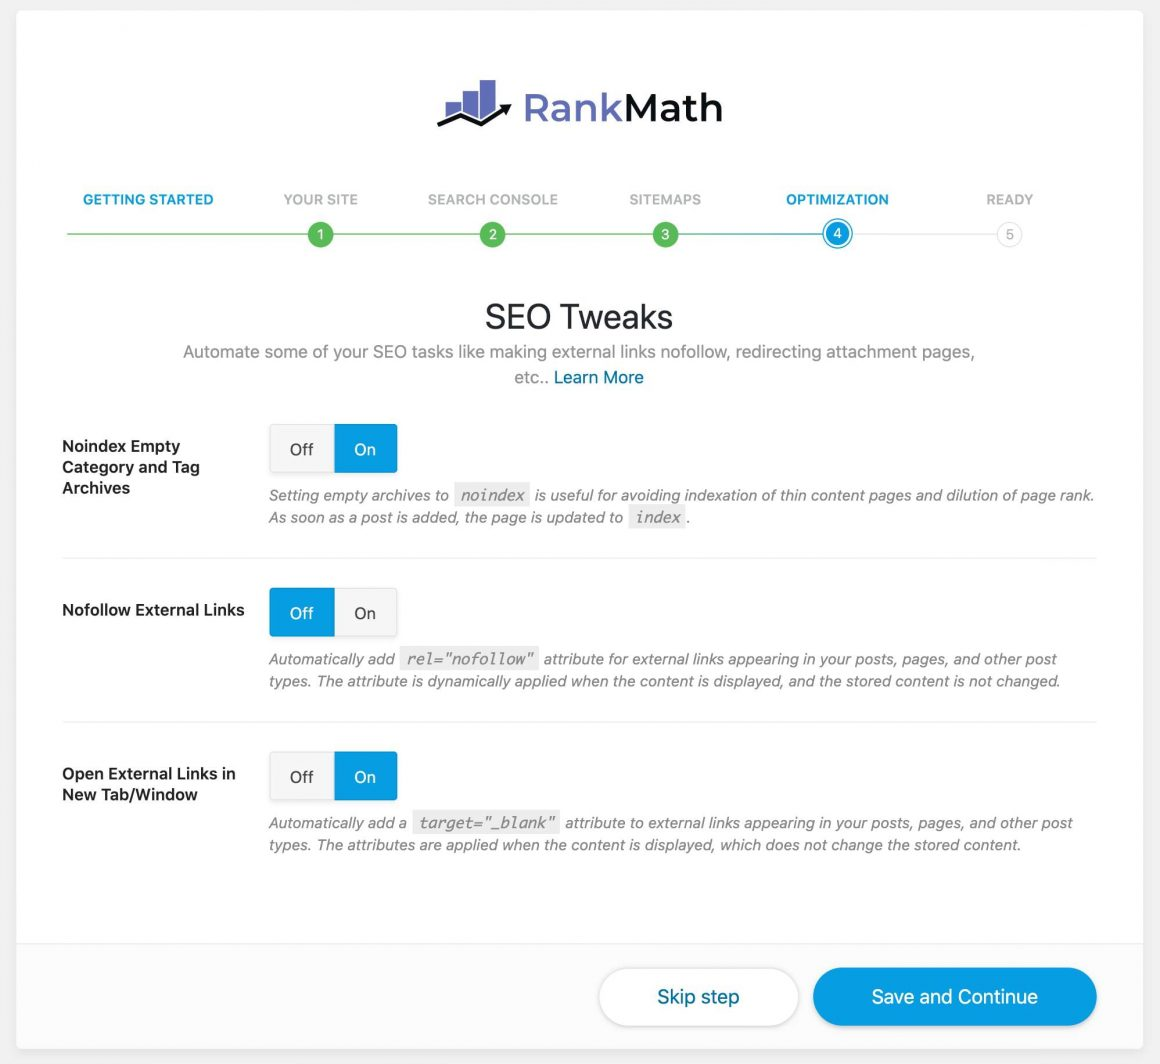 rankmath optimization